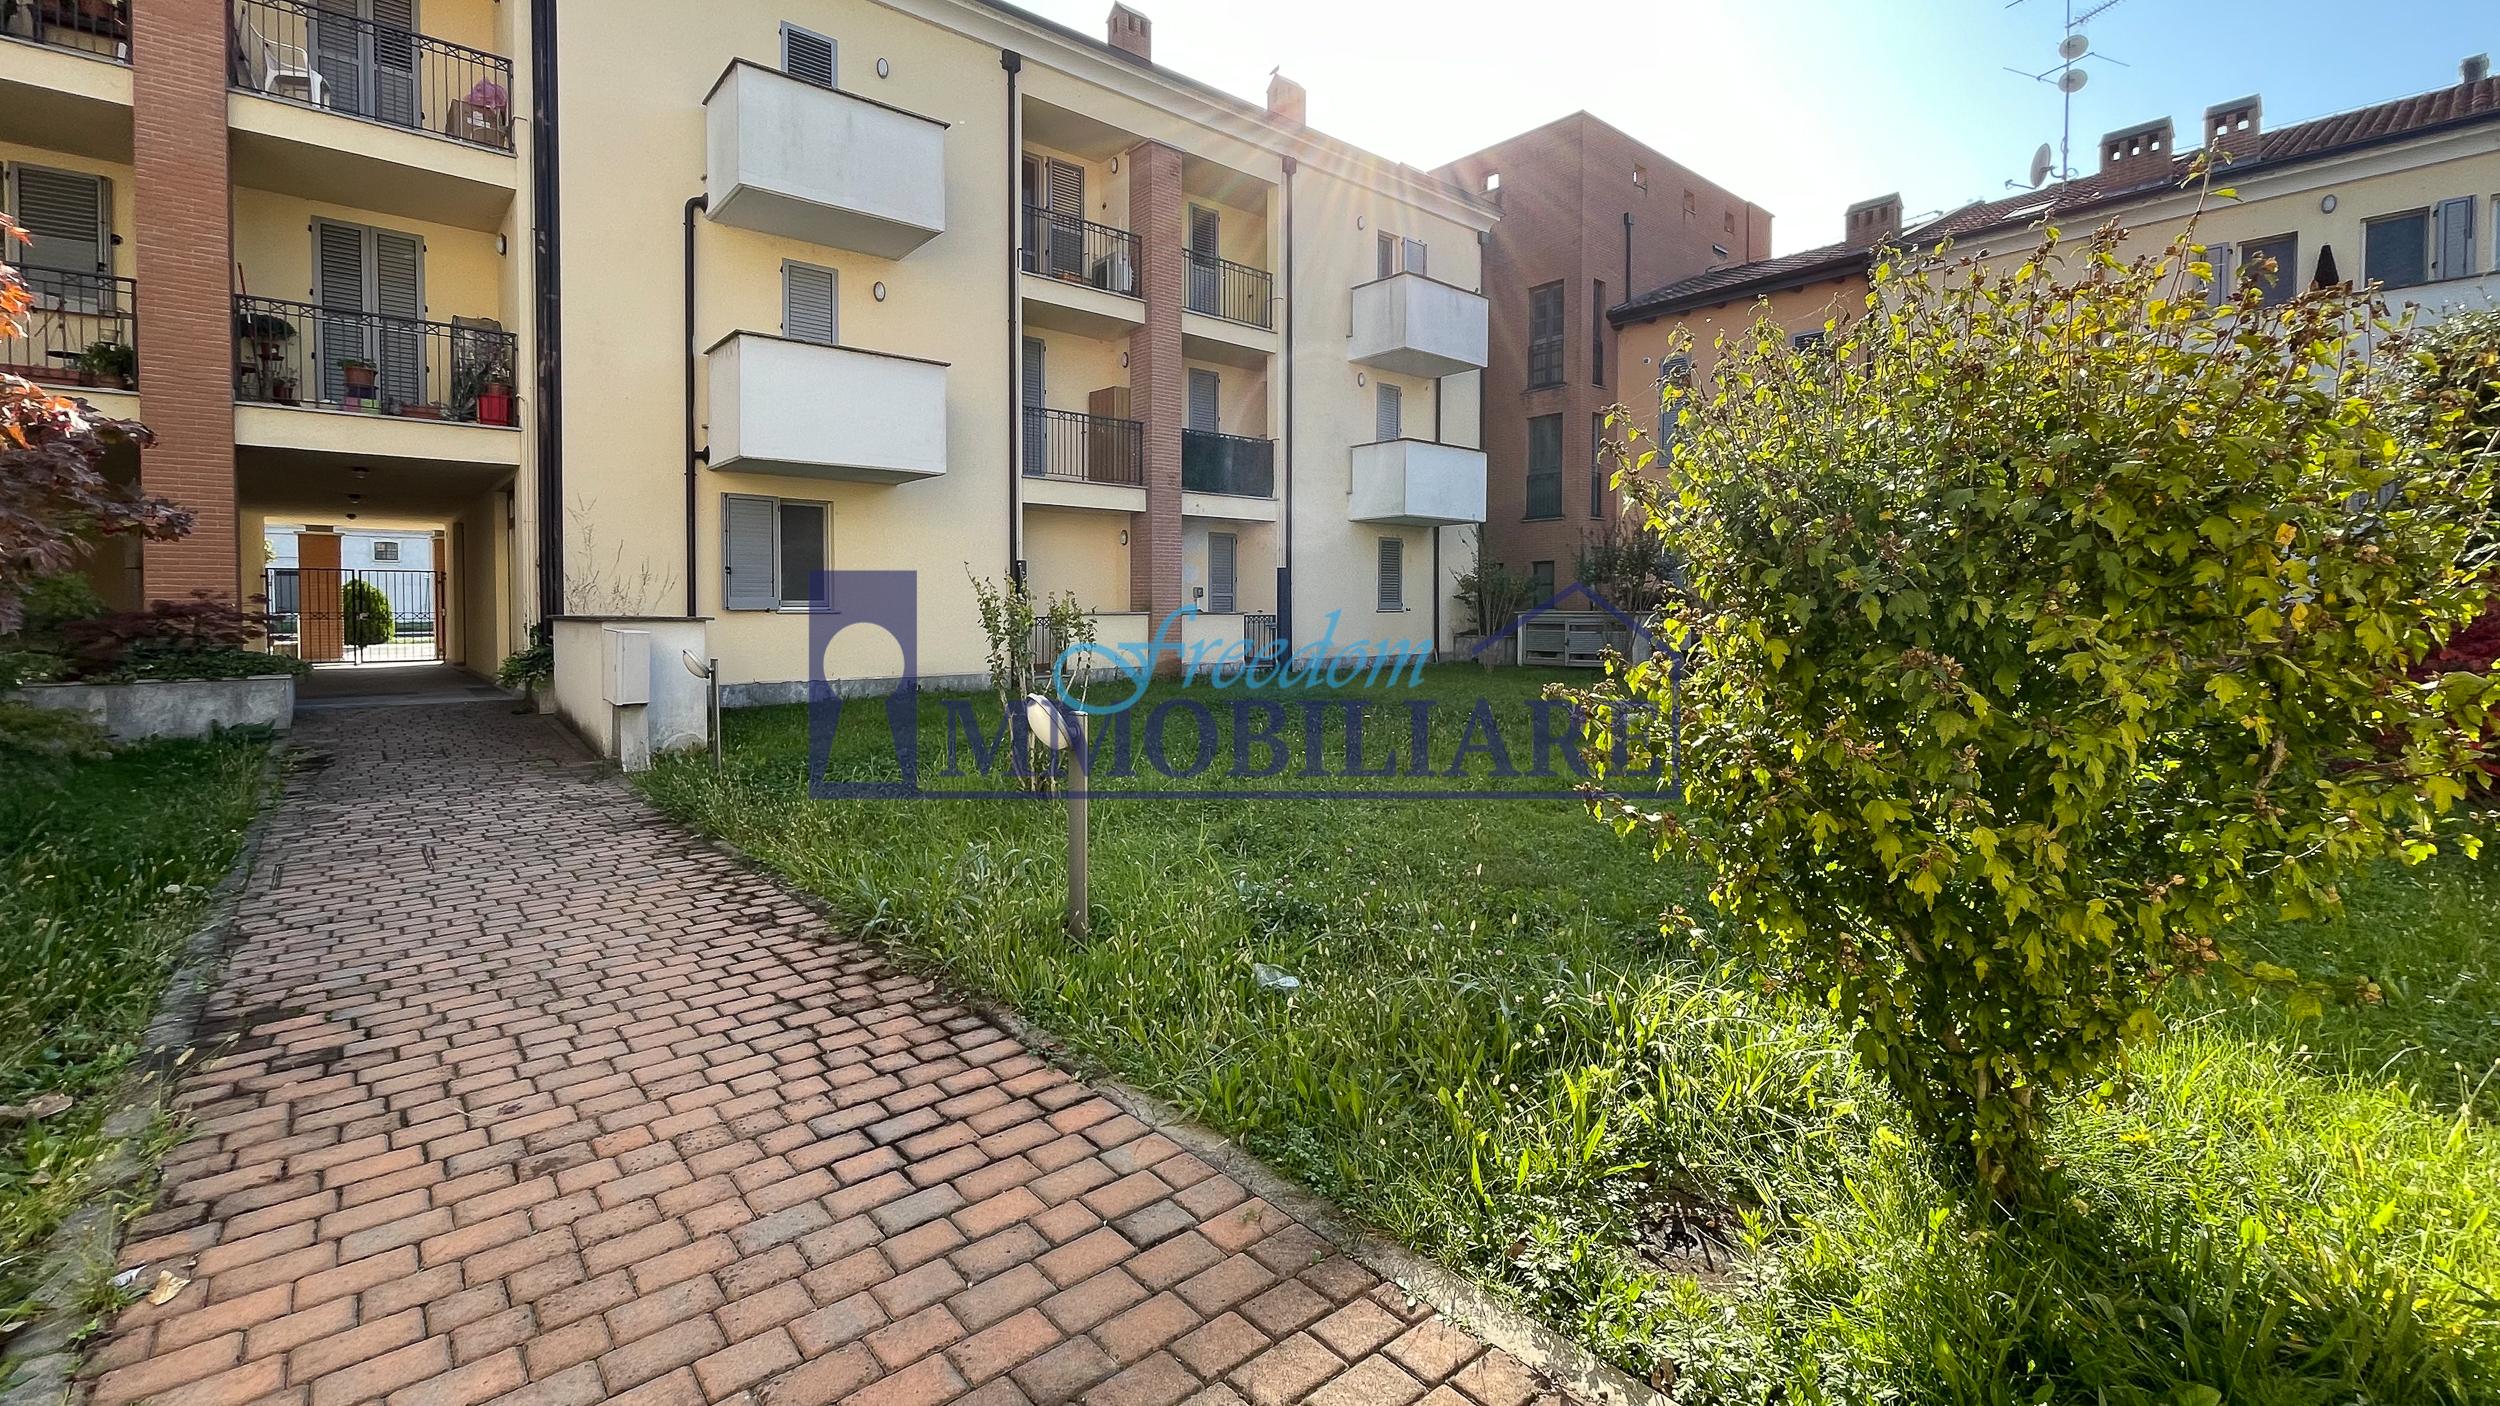 Bilocale piazza Locatelli 12, Torrevecchia Pia